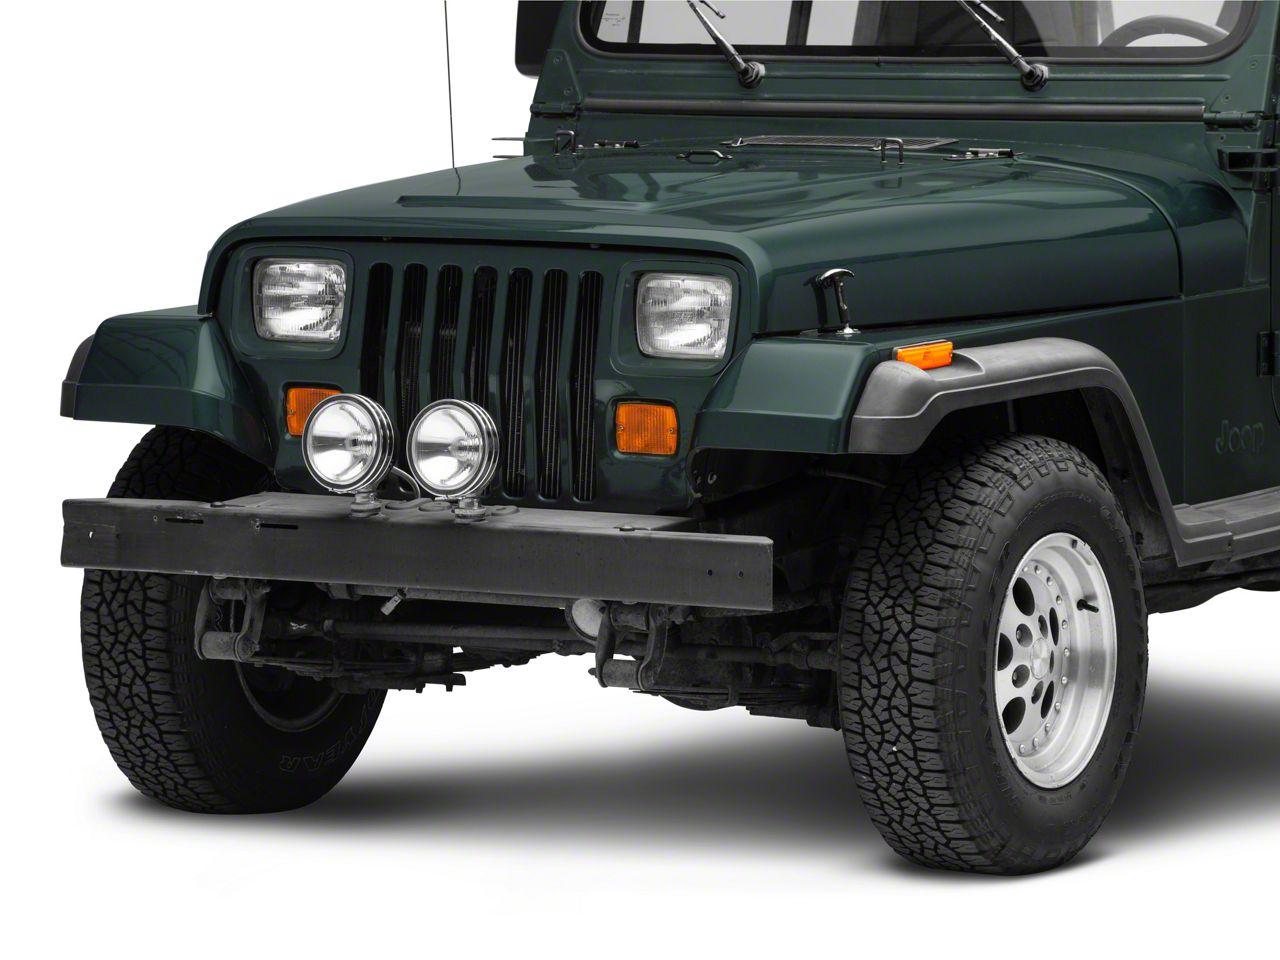 Omix-ADA Side Marker Light - Amber (87-95 Jeep Wrangler YJ)